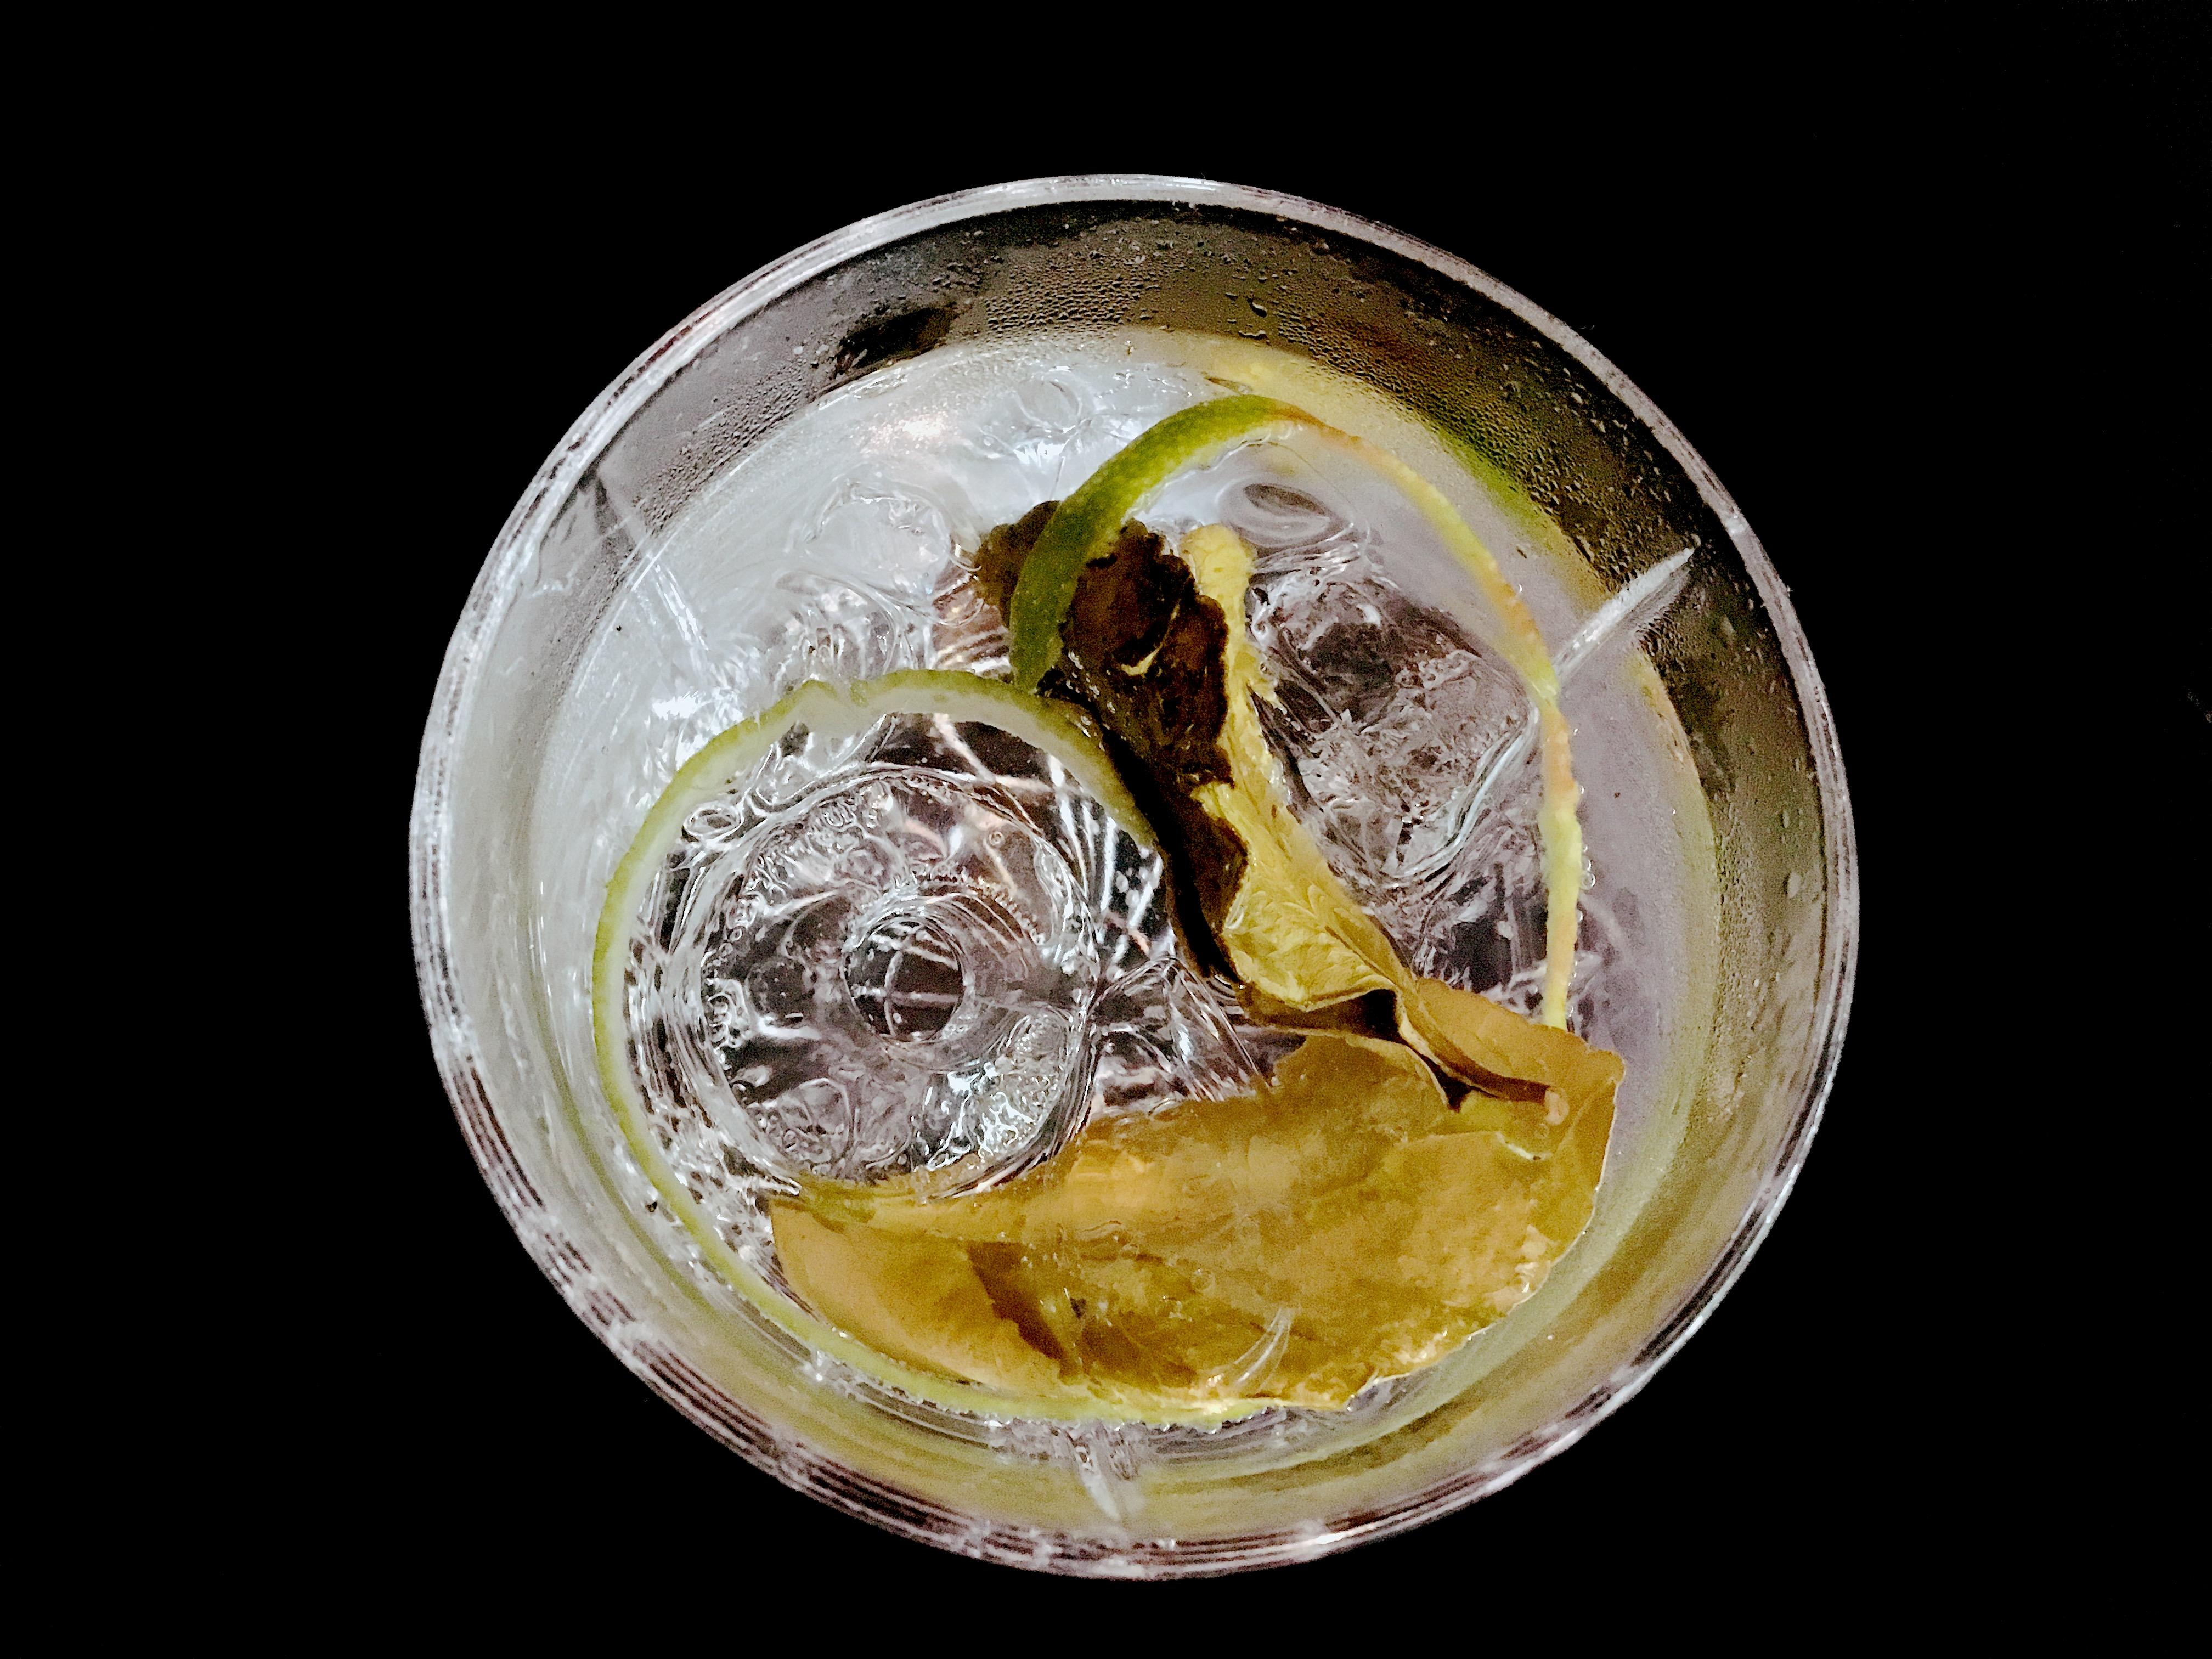 Mundart Kaiserstuhl Dry Gin Kaffir Lime GT im Tumbler